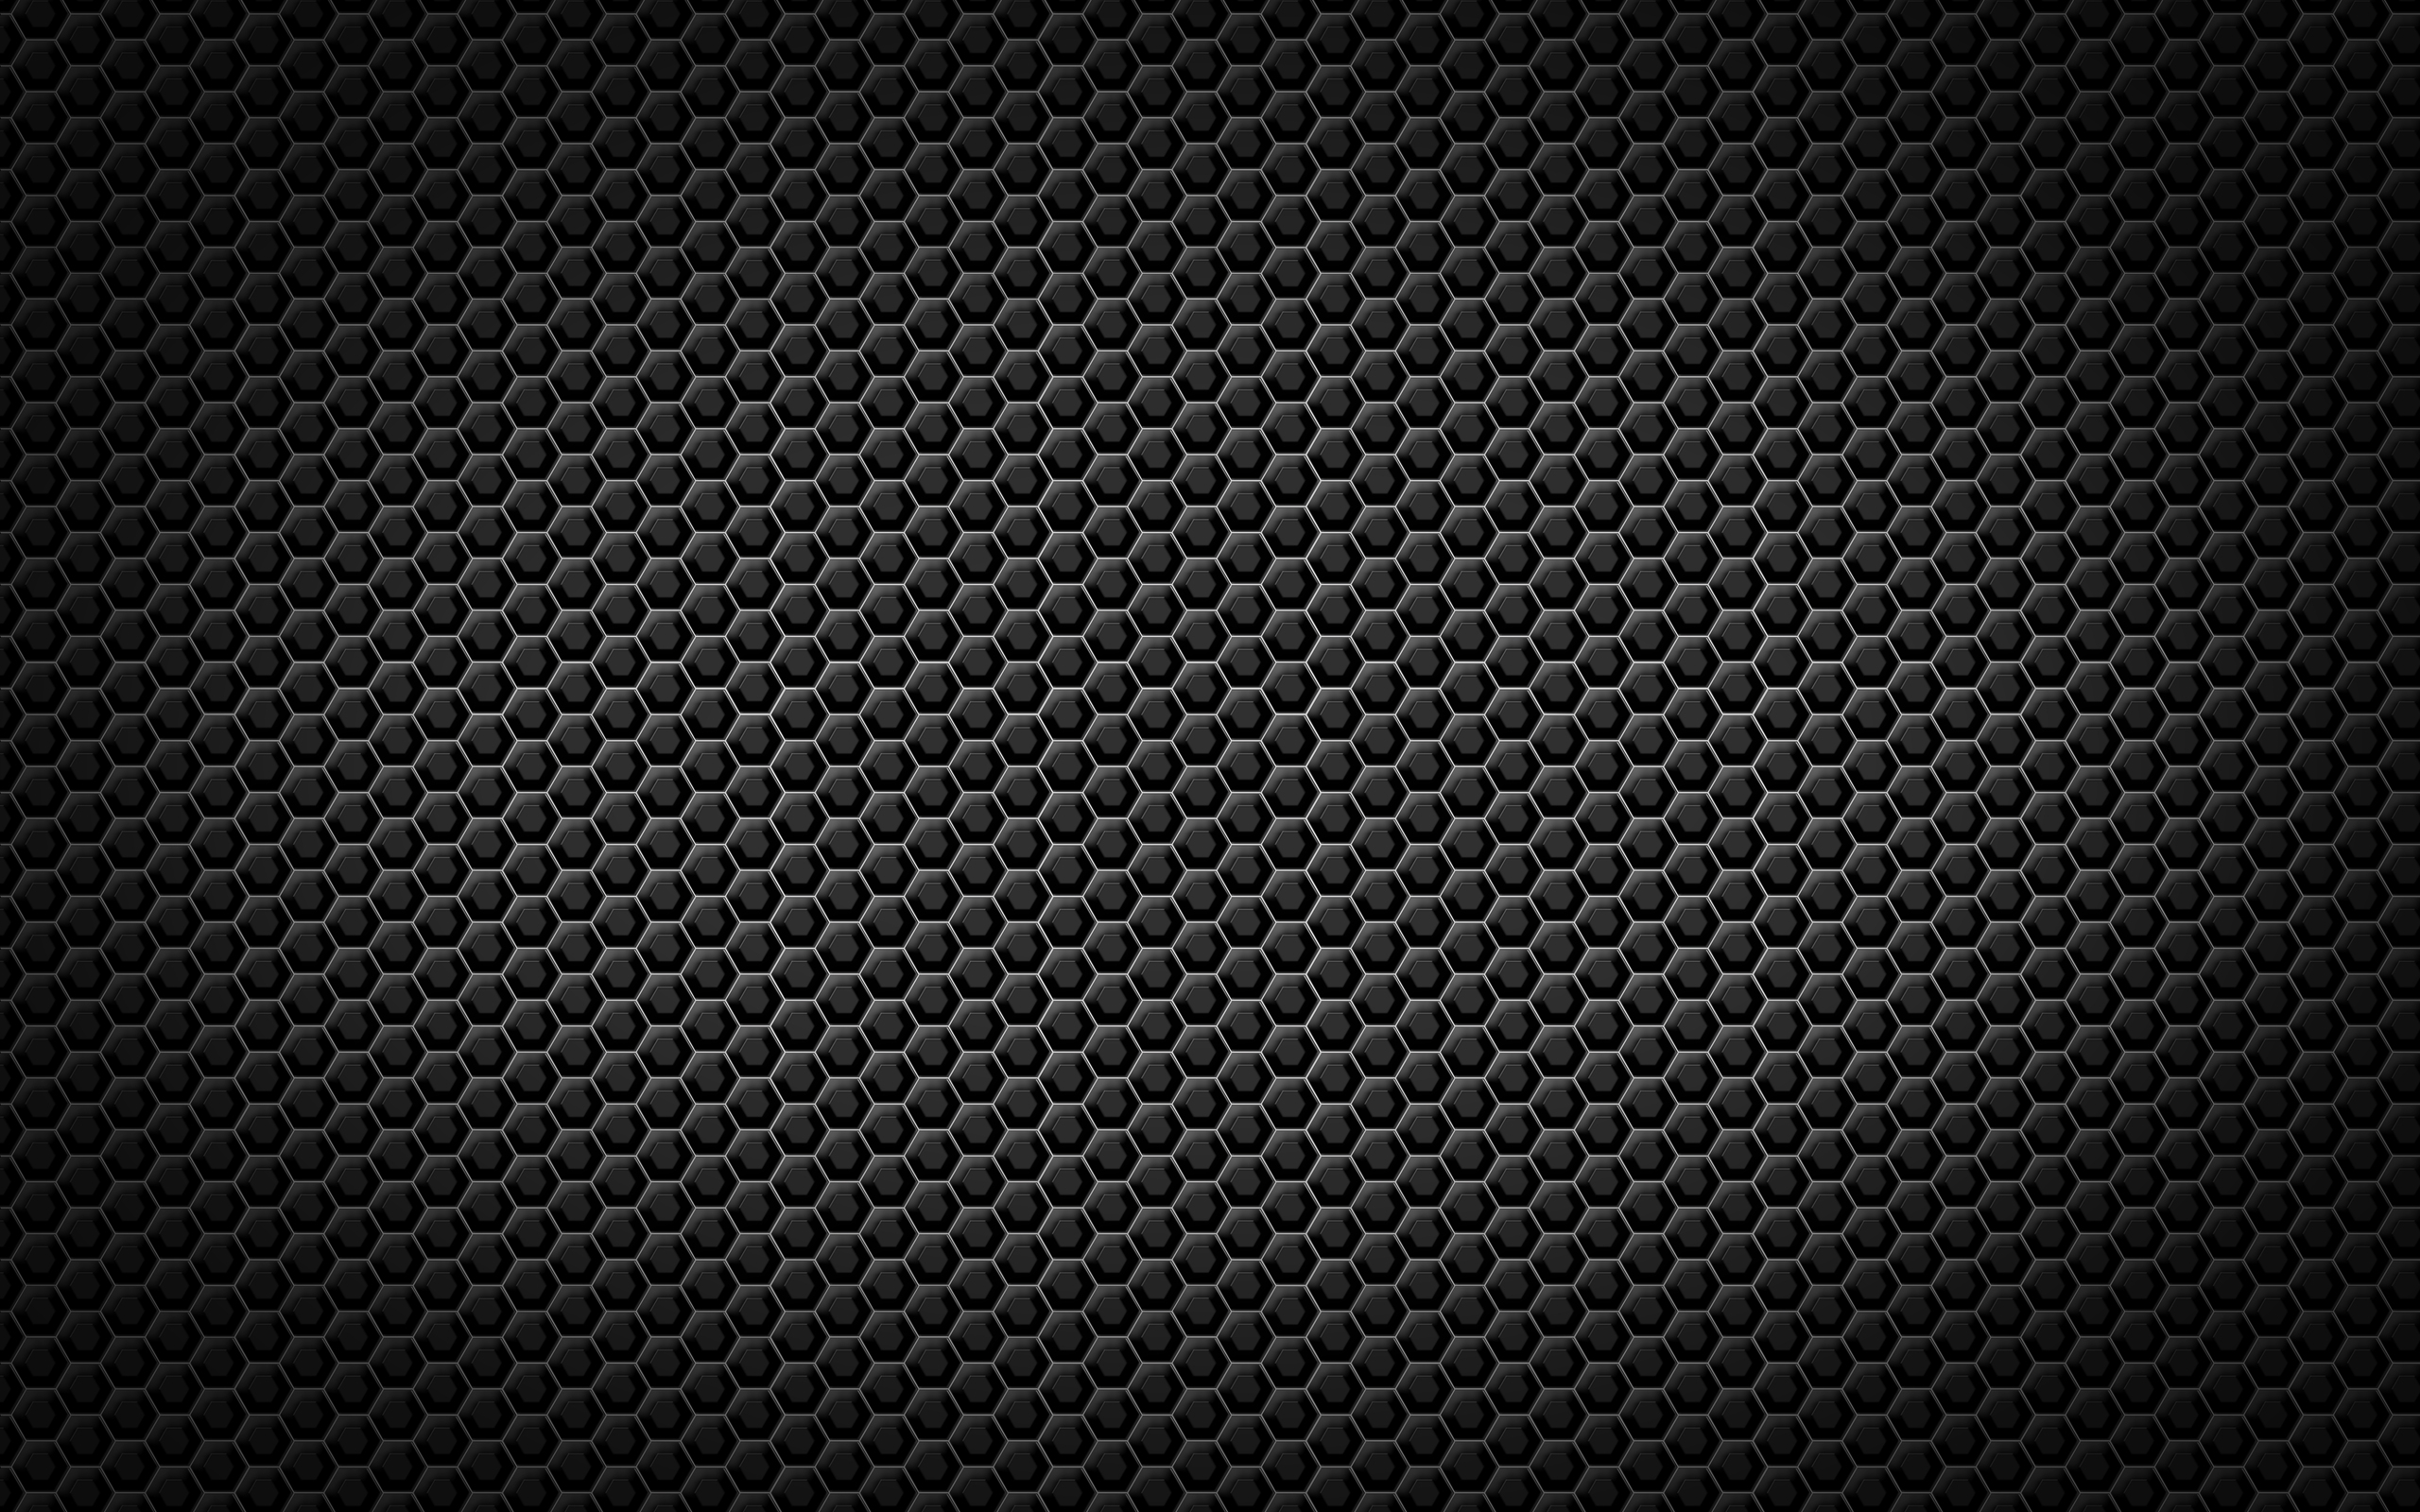 Digital blasphemy black wallpaper rose backgrounds pattern   1073022 2560x1600